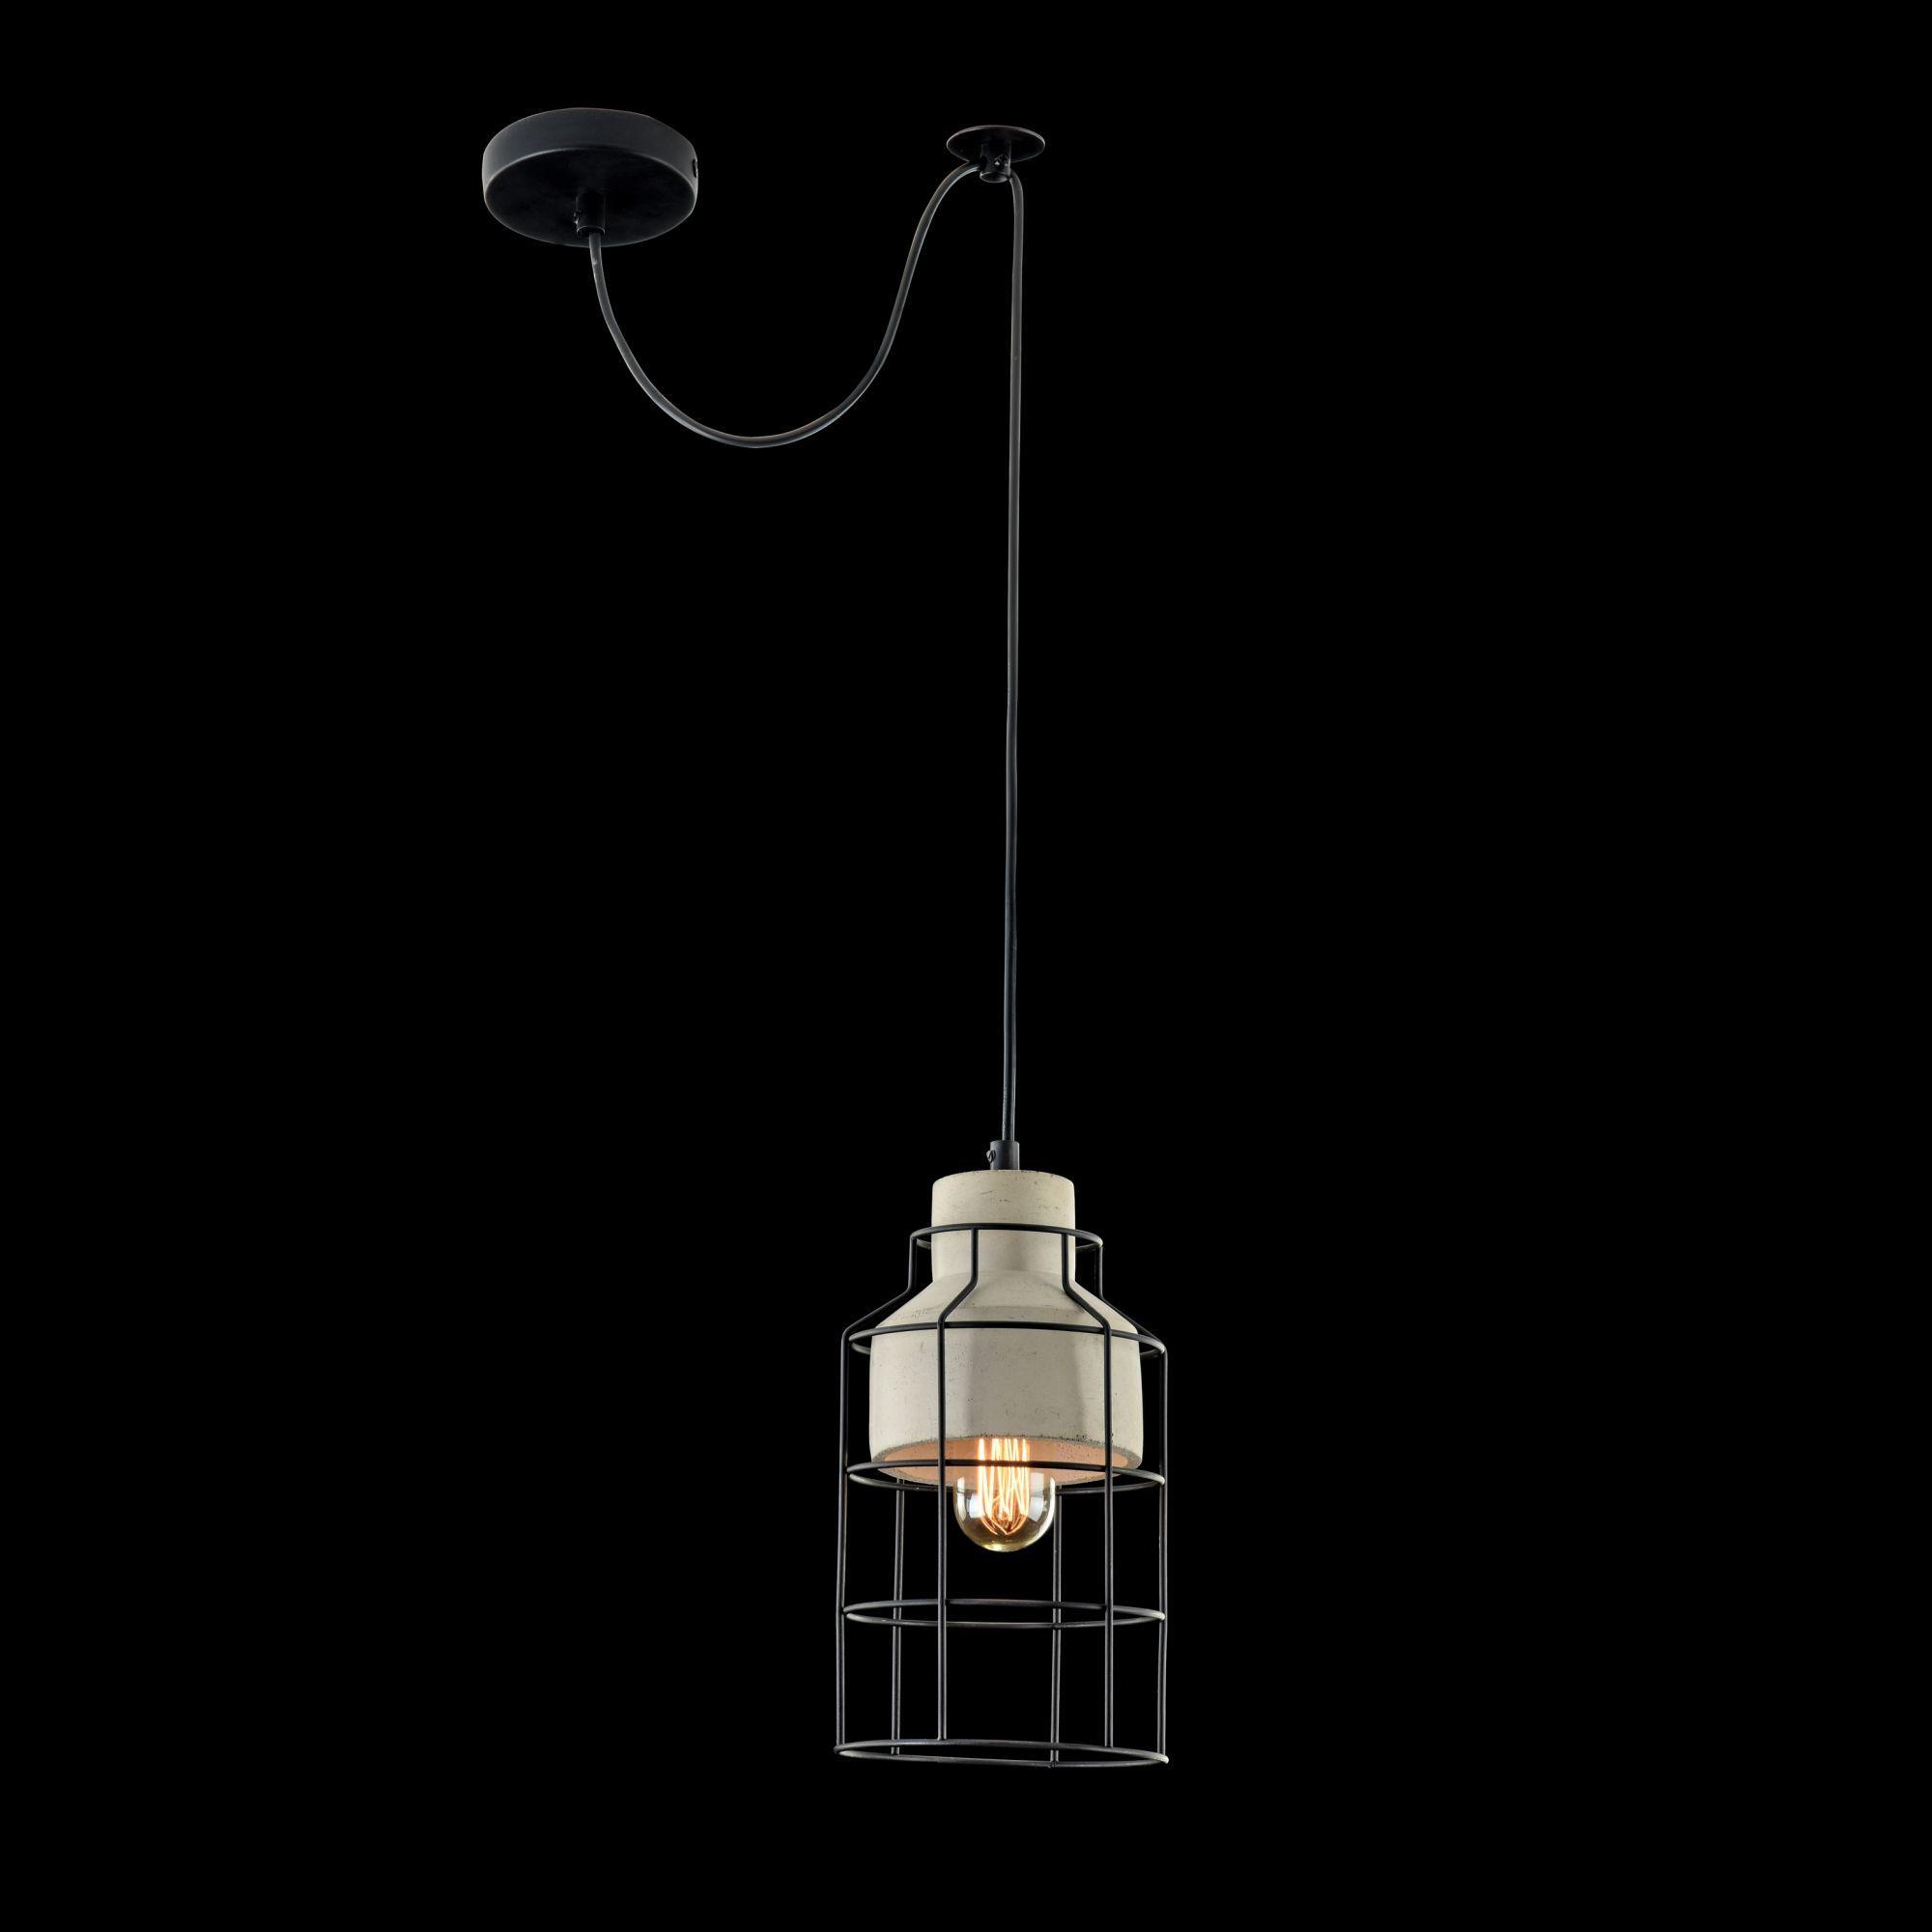 Подвесной светильник Maytoni Gosford T441-PL-01-GR, 1xE27x60W, черный, серый, металл, бетон - фото 4